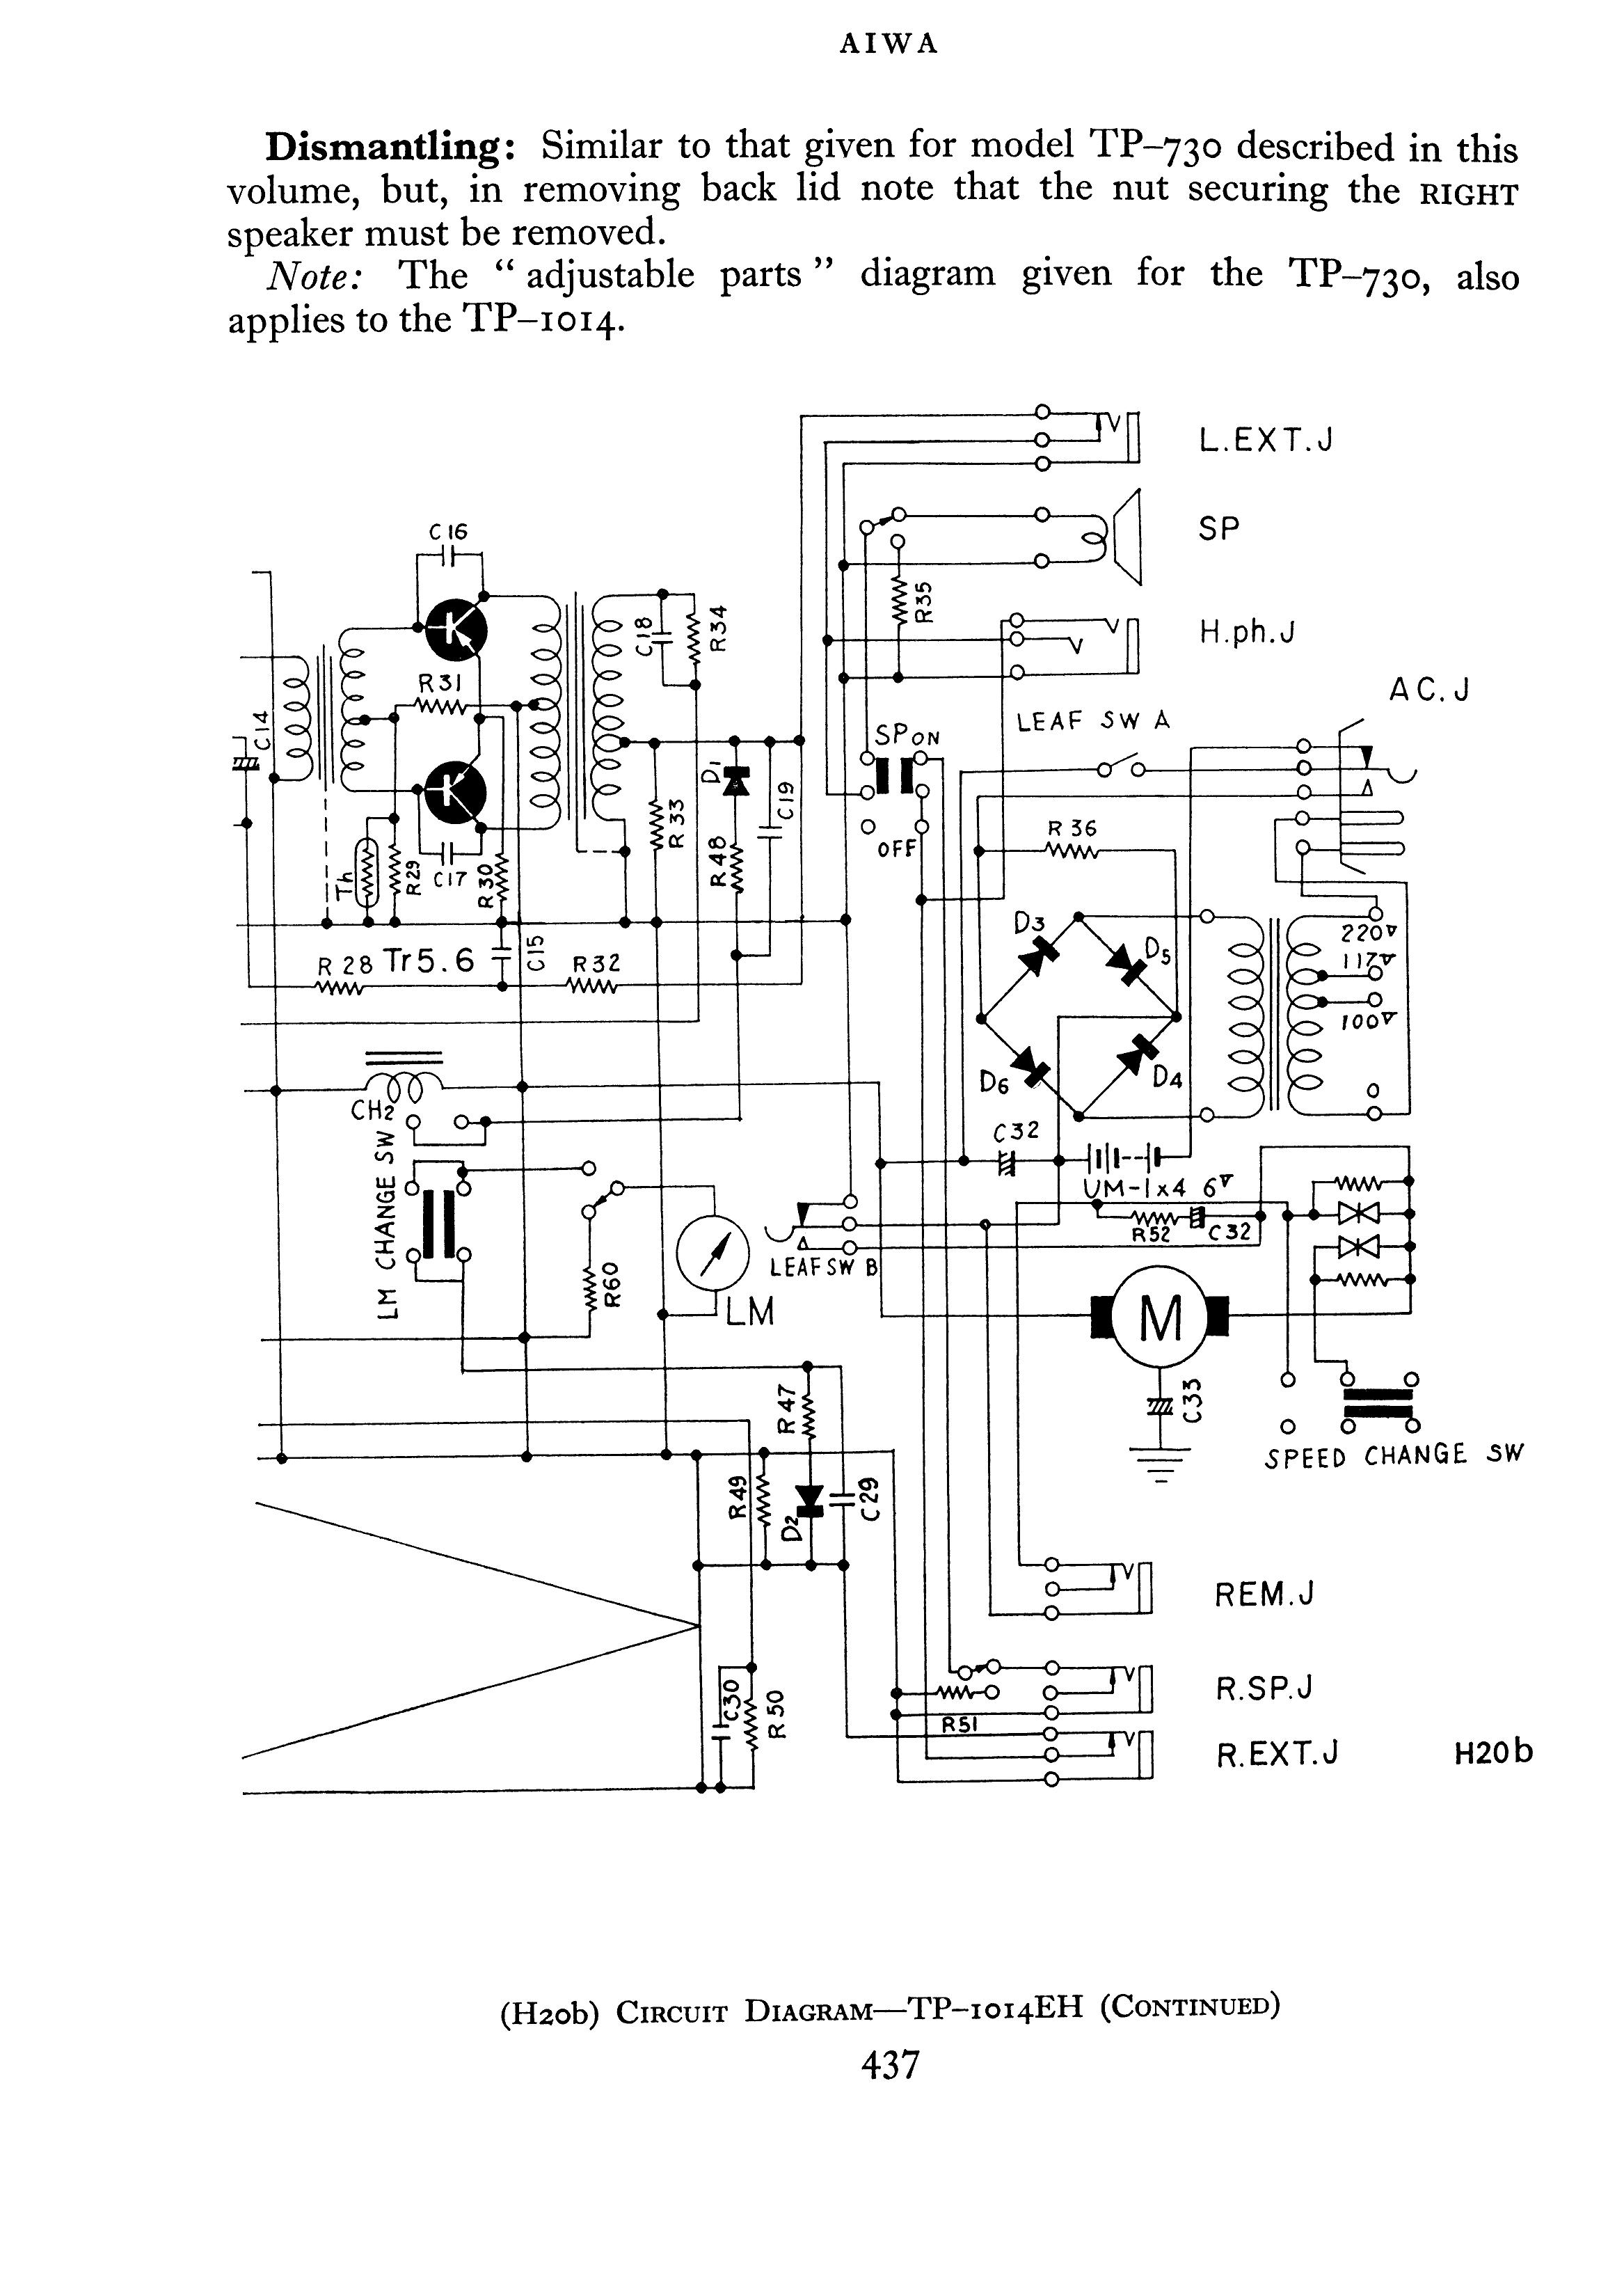 Antique Radio Forums View Topic Aiwa Tp 1014 Schematic Anyone Wiring Diagram B Http A4pbasecom O10 56 215056 1 166 K6xwb